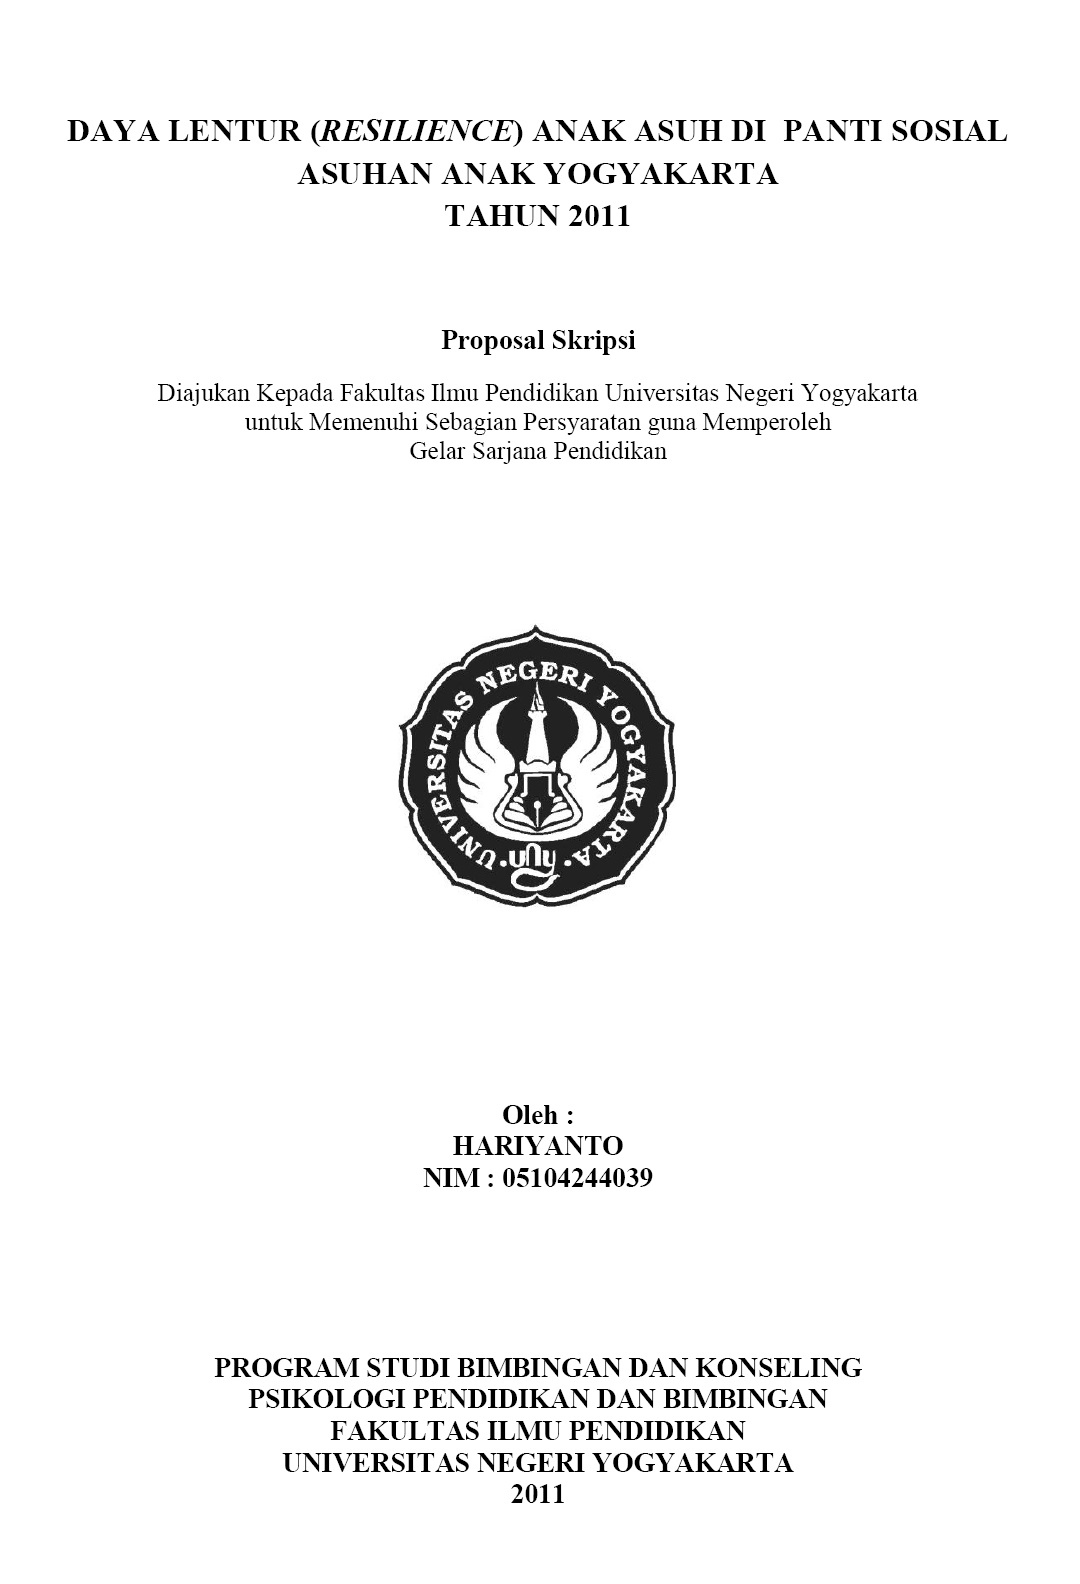 rp_Contoh-Proposal-Skripsi.jpg